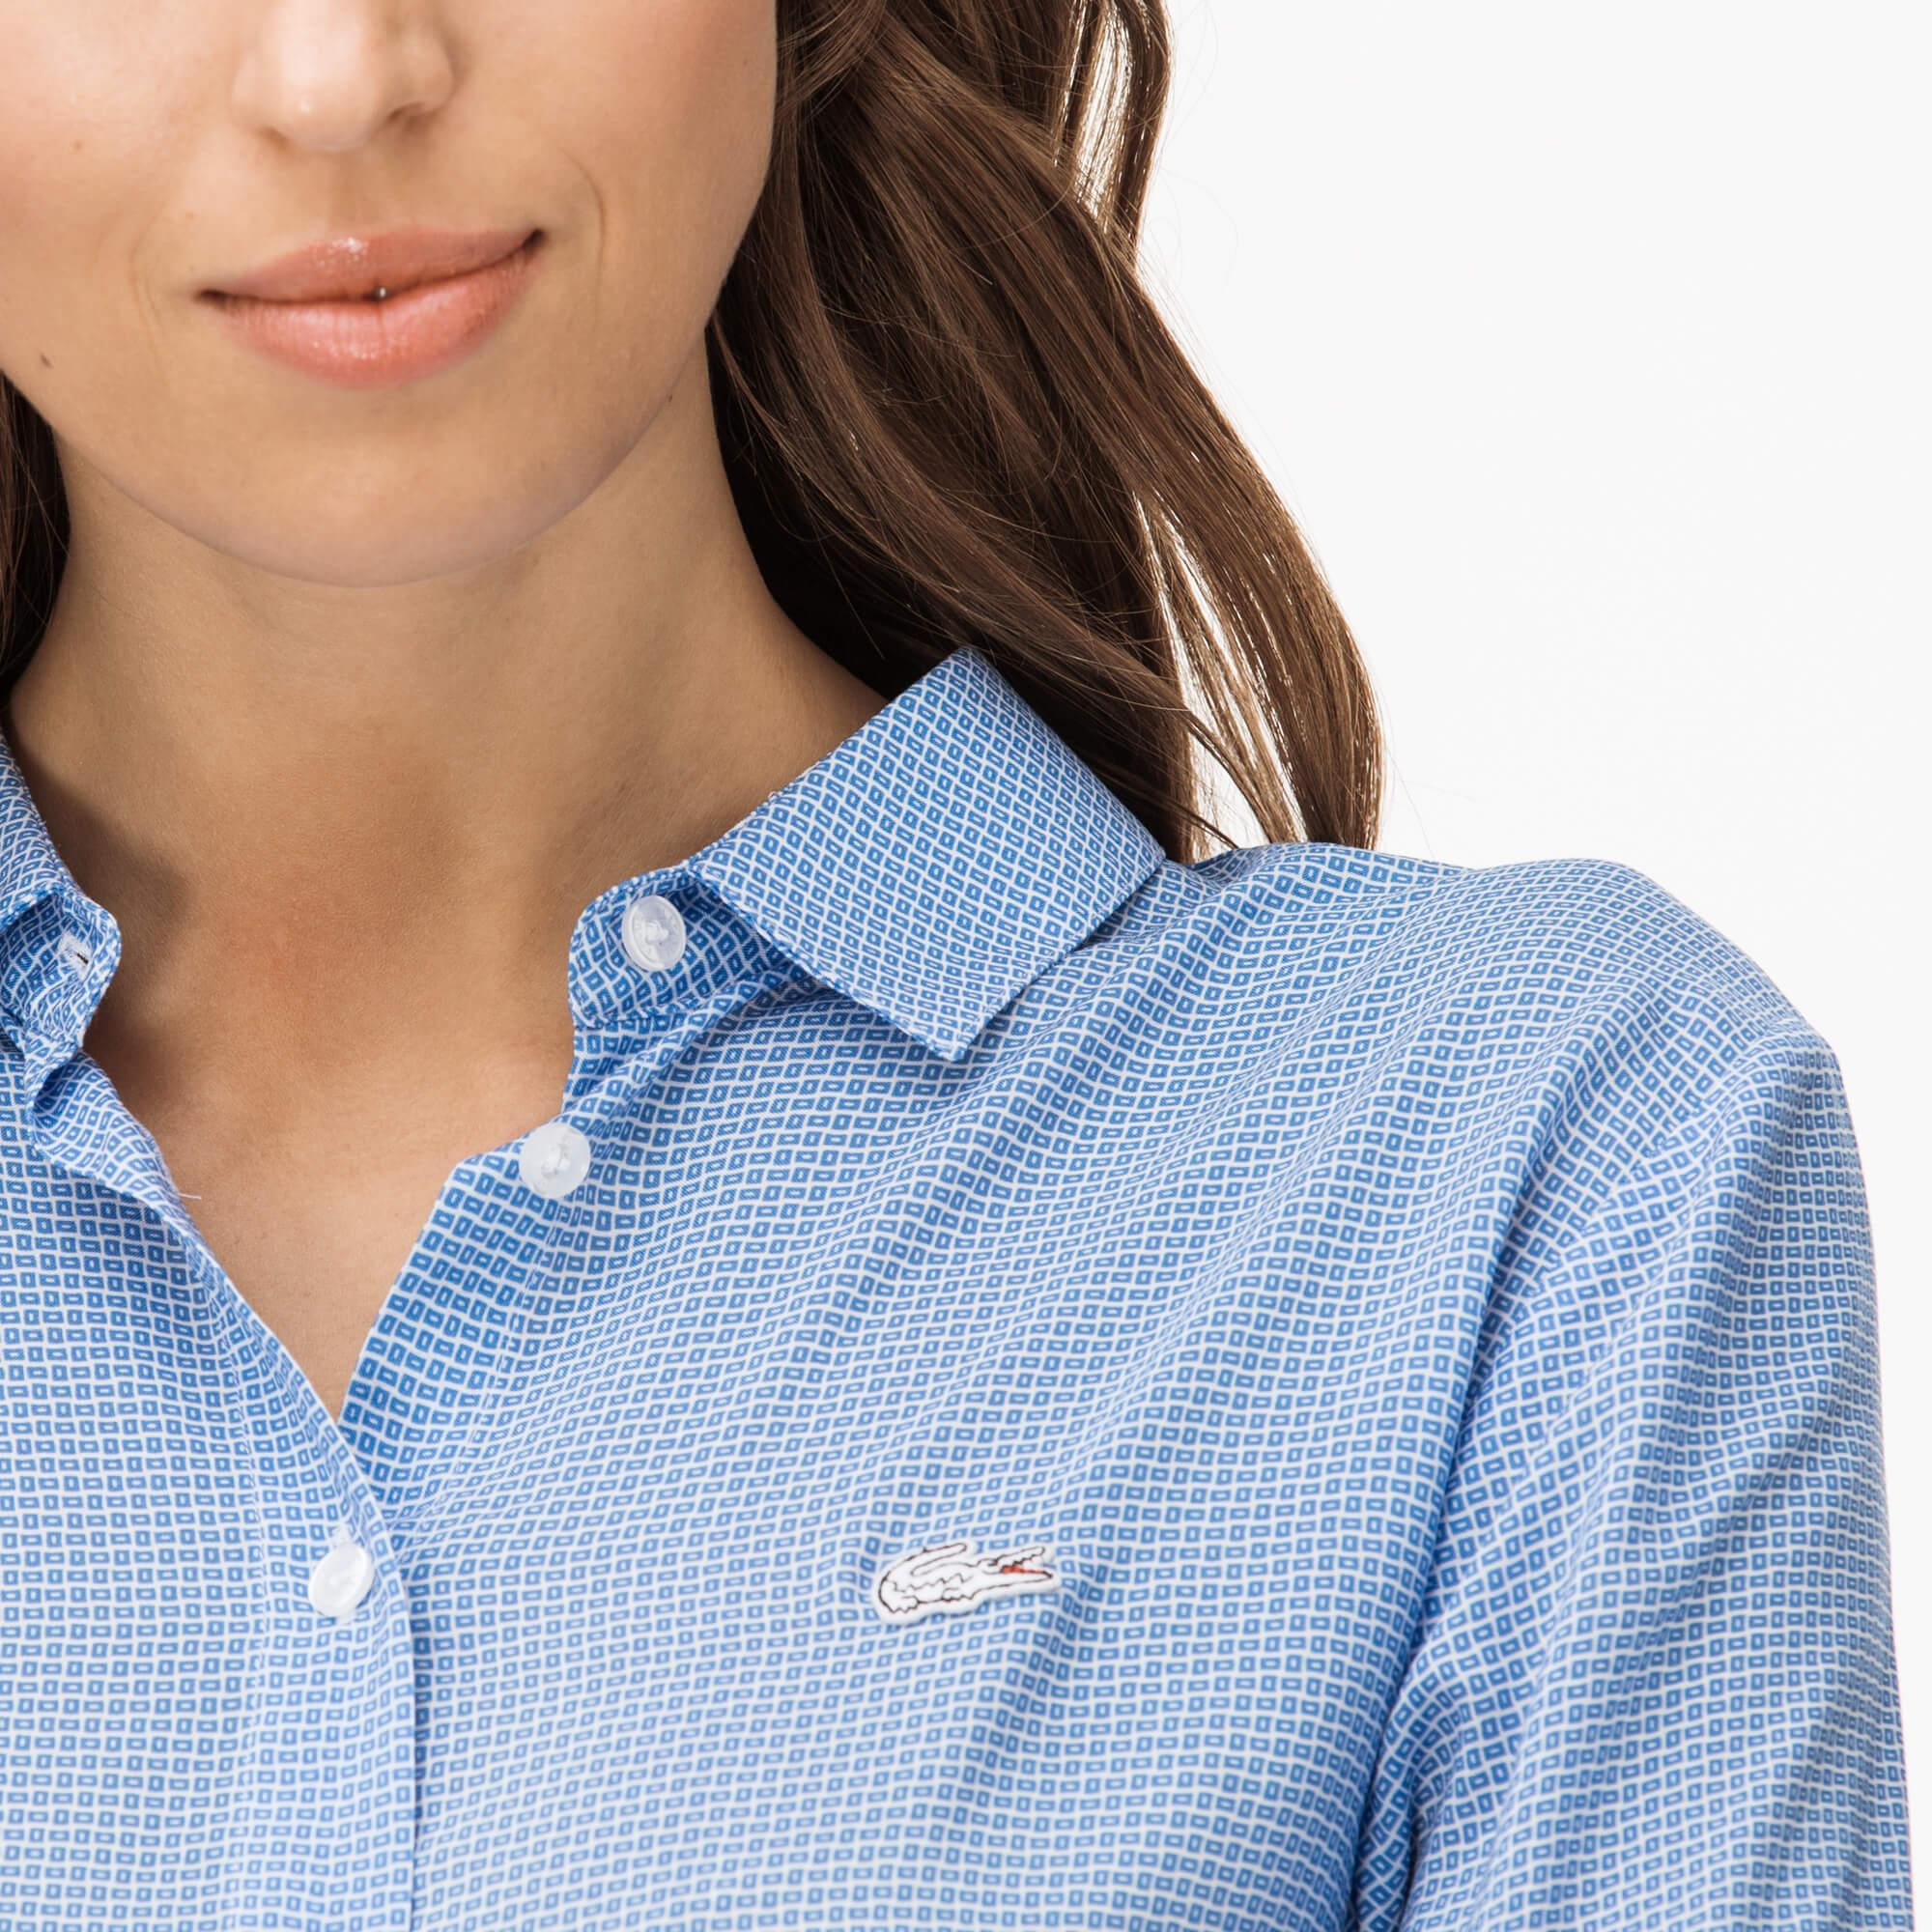 Lacoste Women's Long Sleeve Woven Shirt